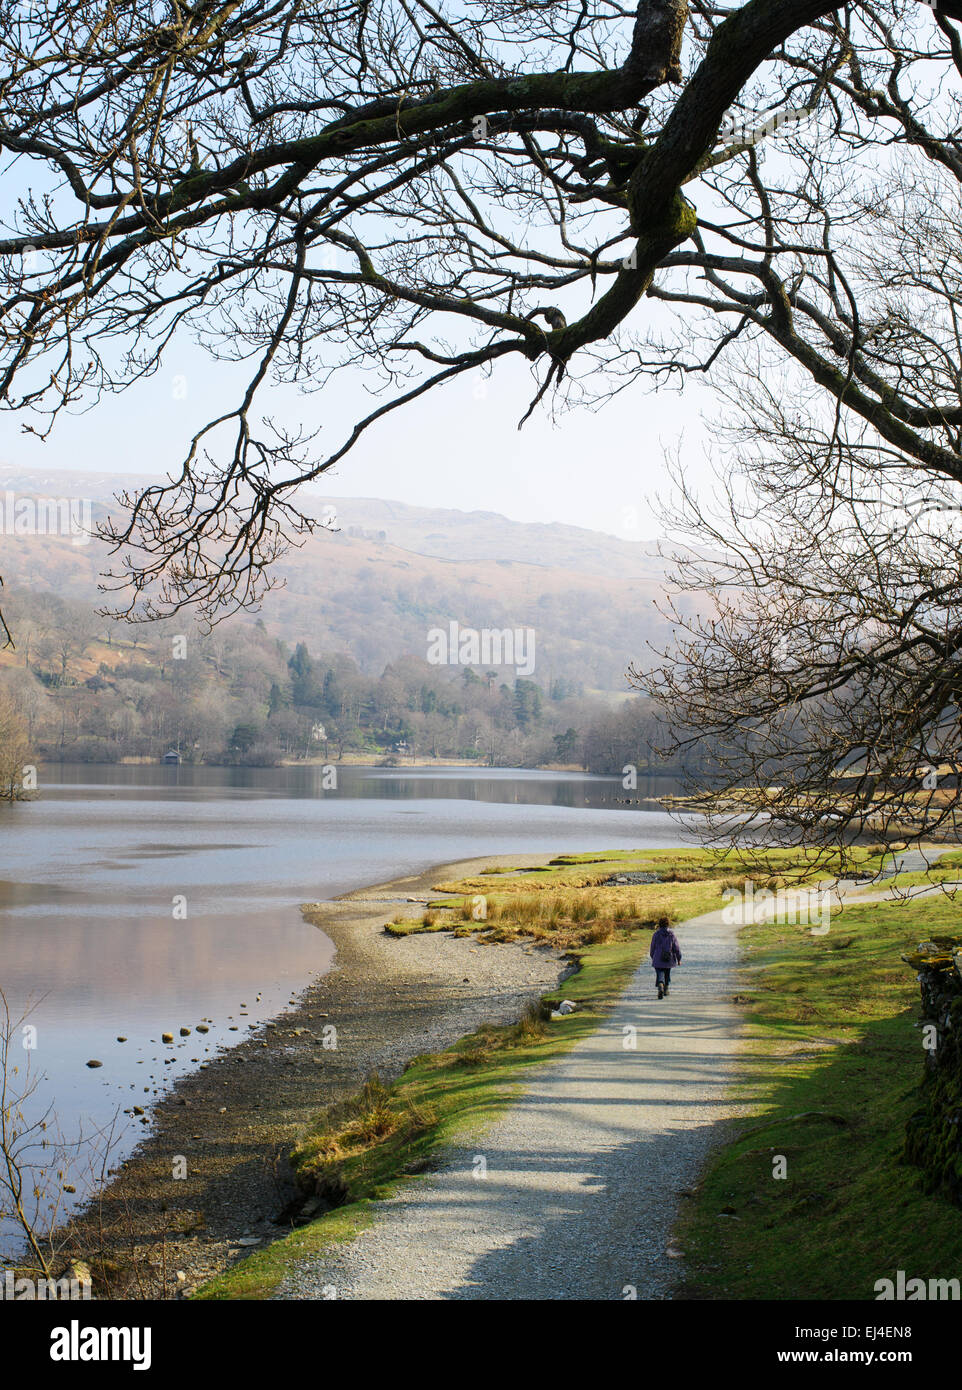 a-woman-walking-along-the-empty-lakeside